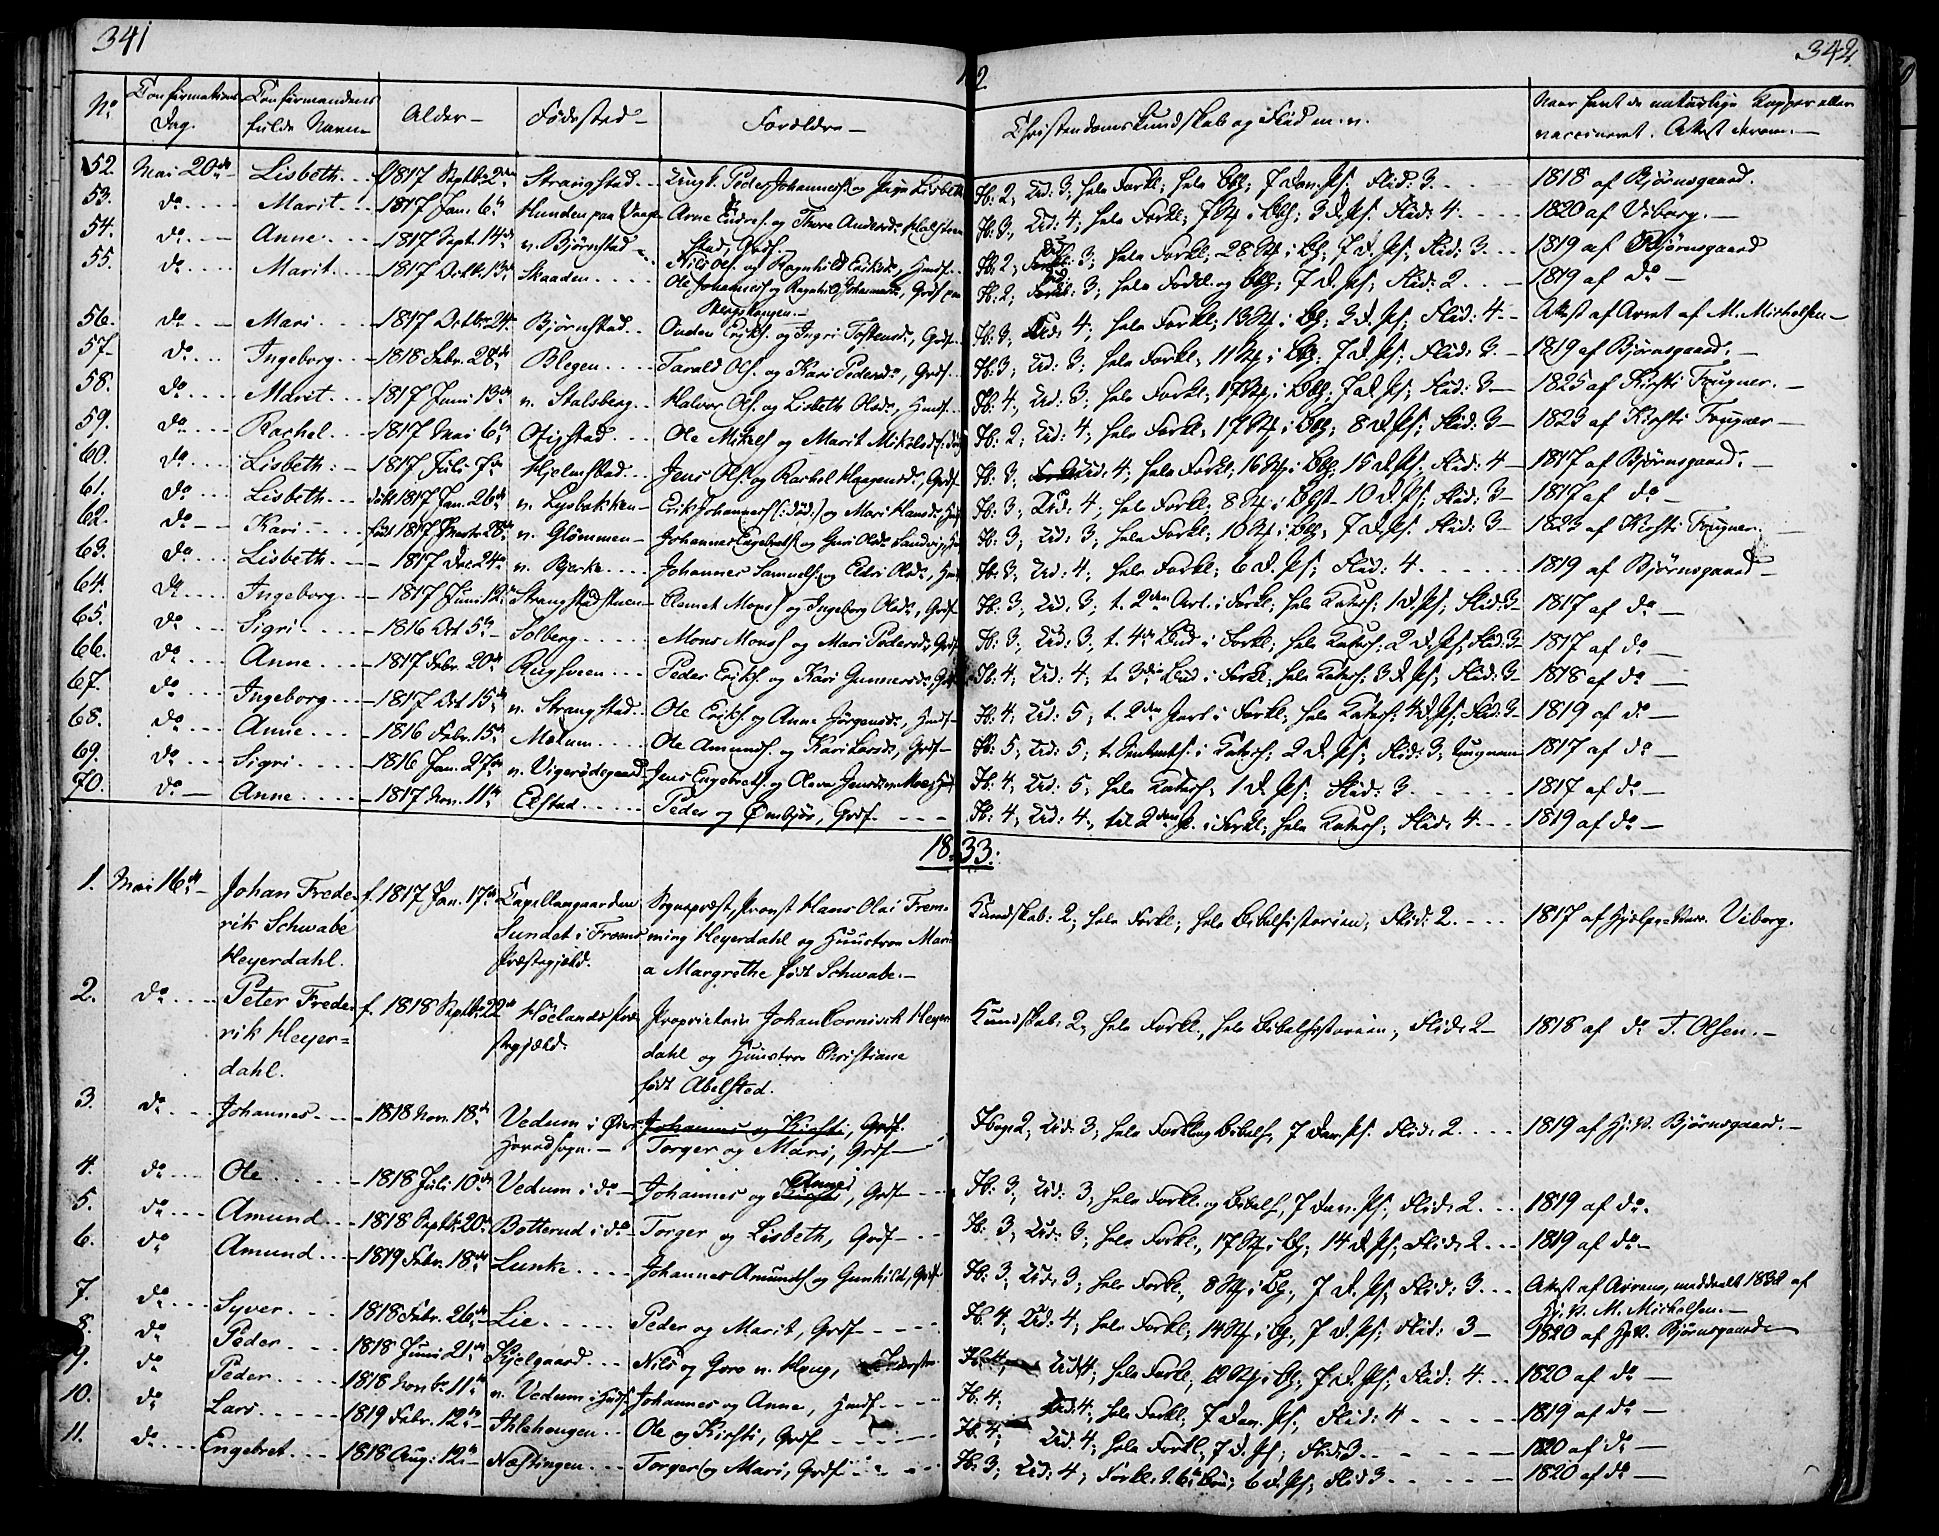 SAH, Øyer prestekontor, Ministerialbok nr. 4, 1824-1841, s. 341-342